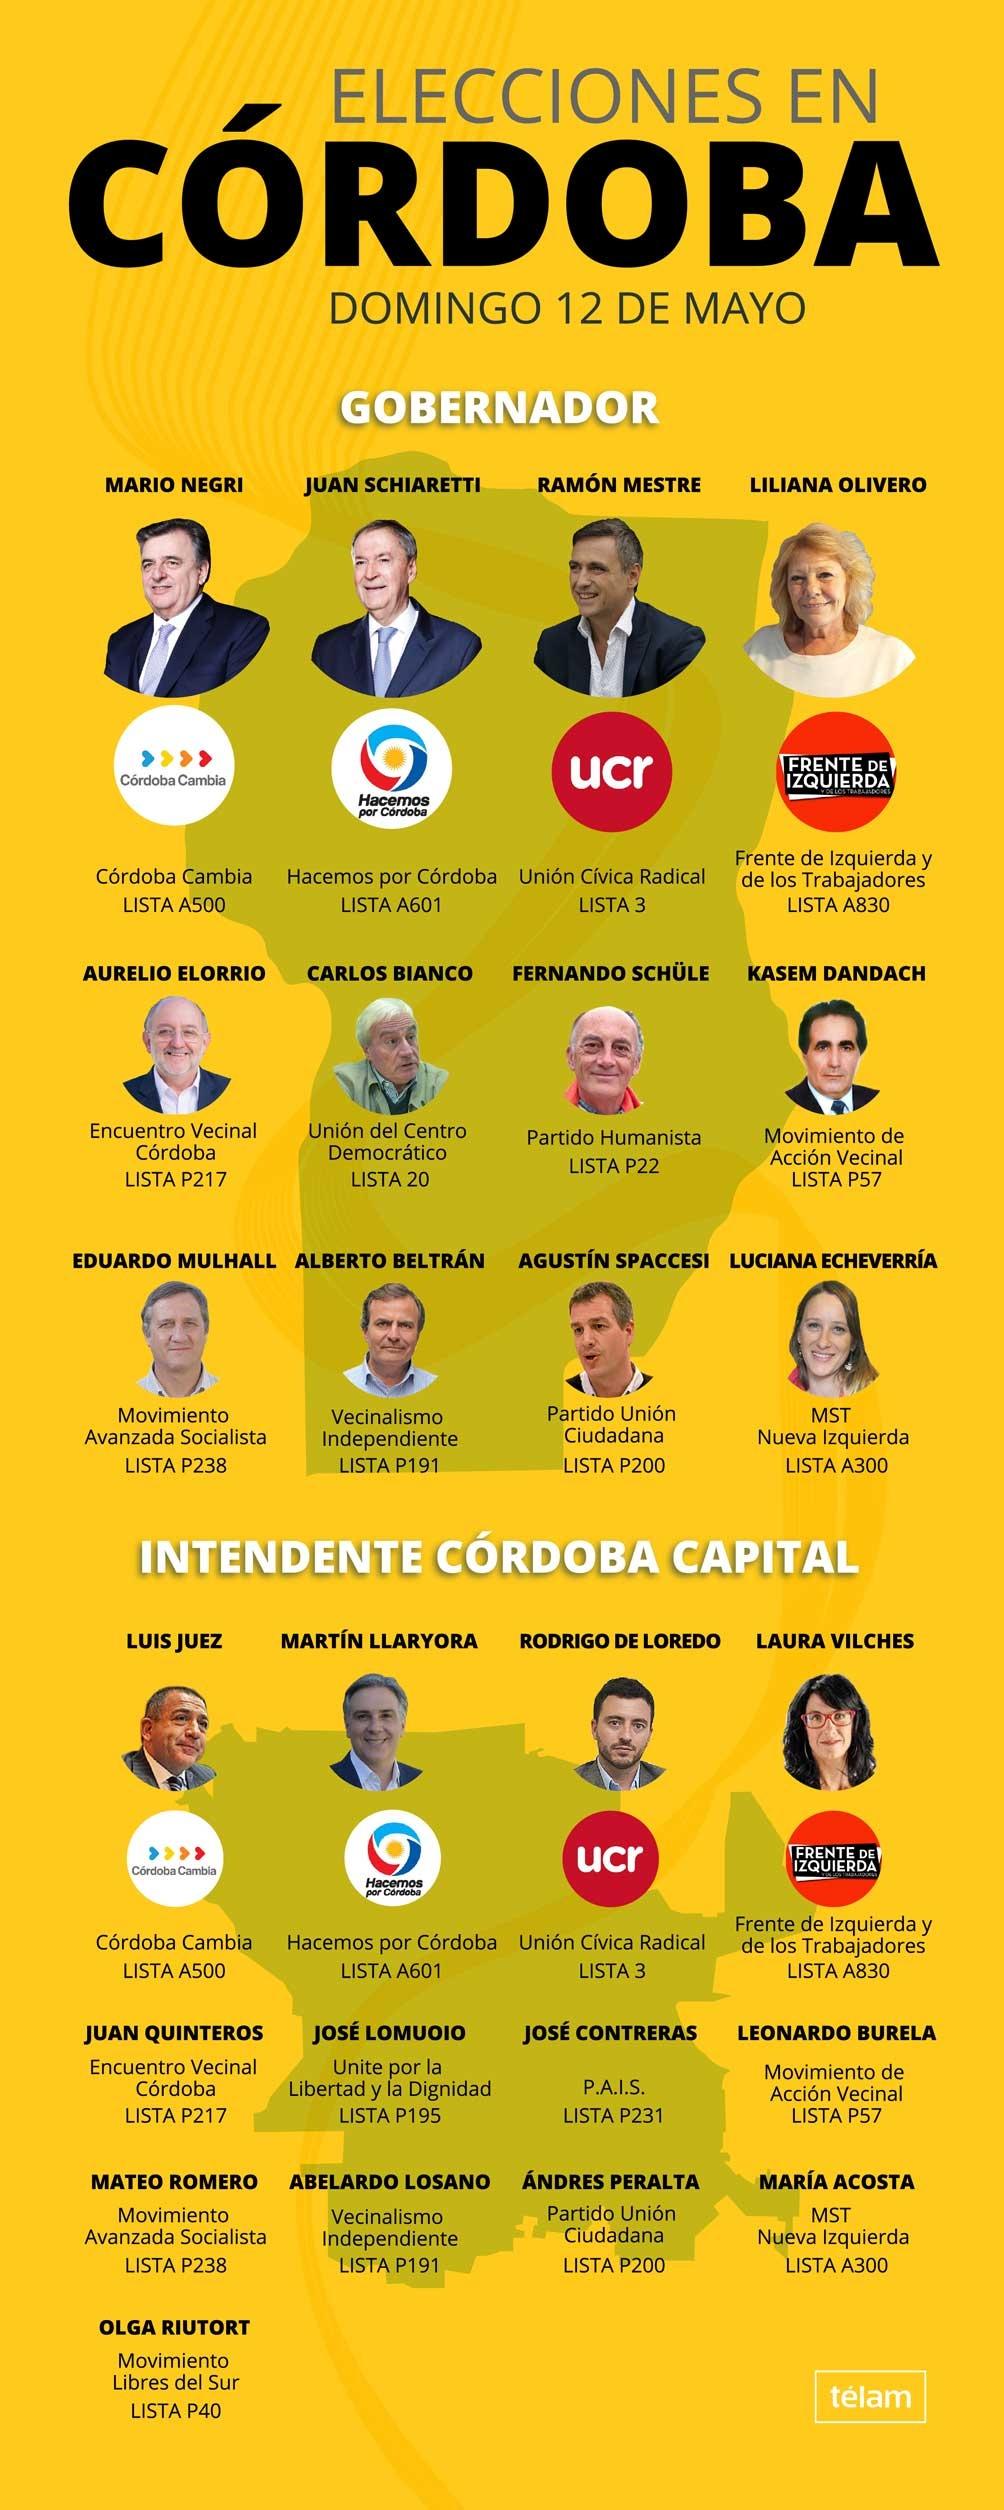 Las 12 fórmulas que competirán mañana por la gobernación de Córdoba